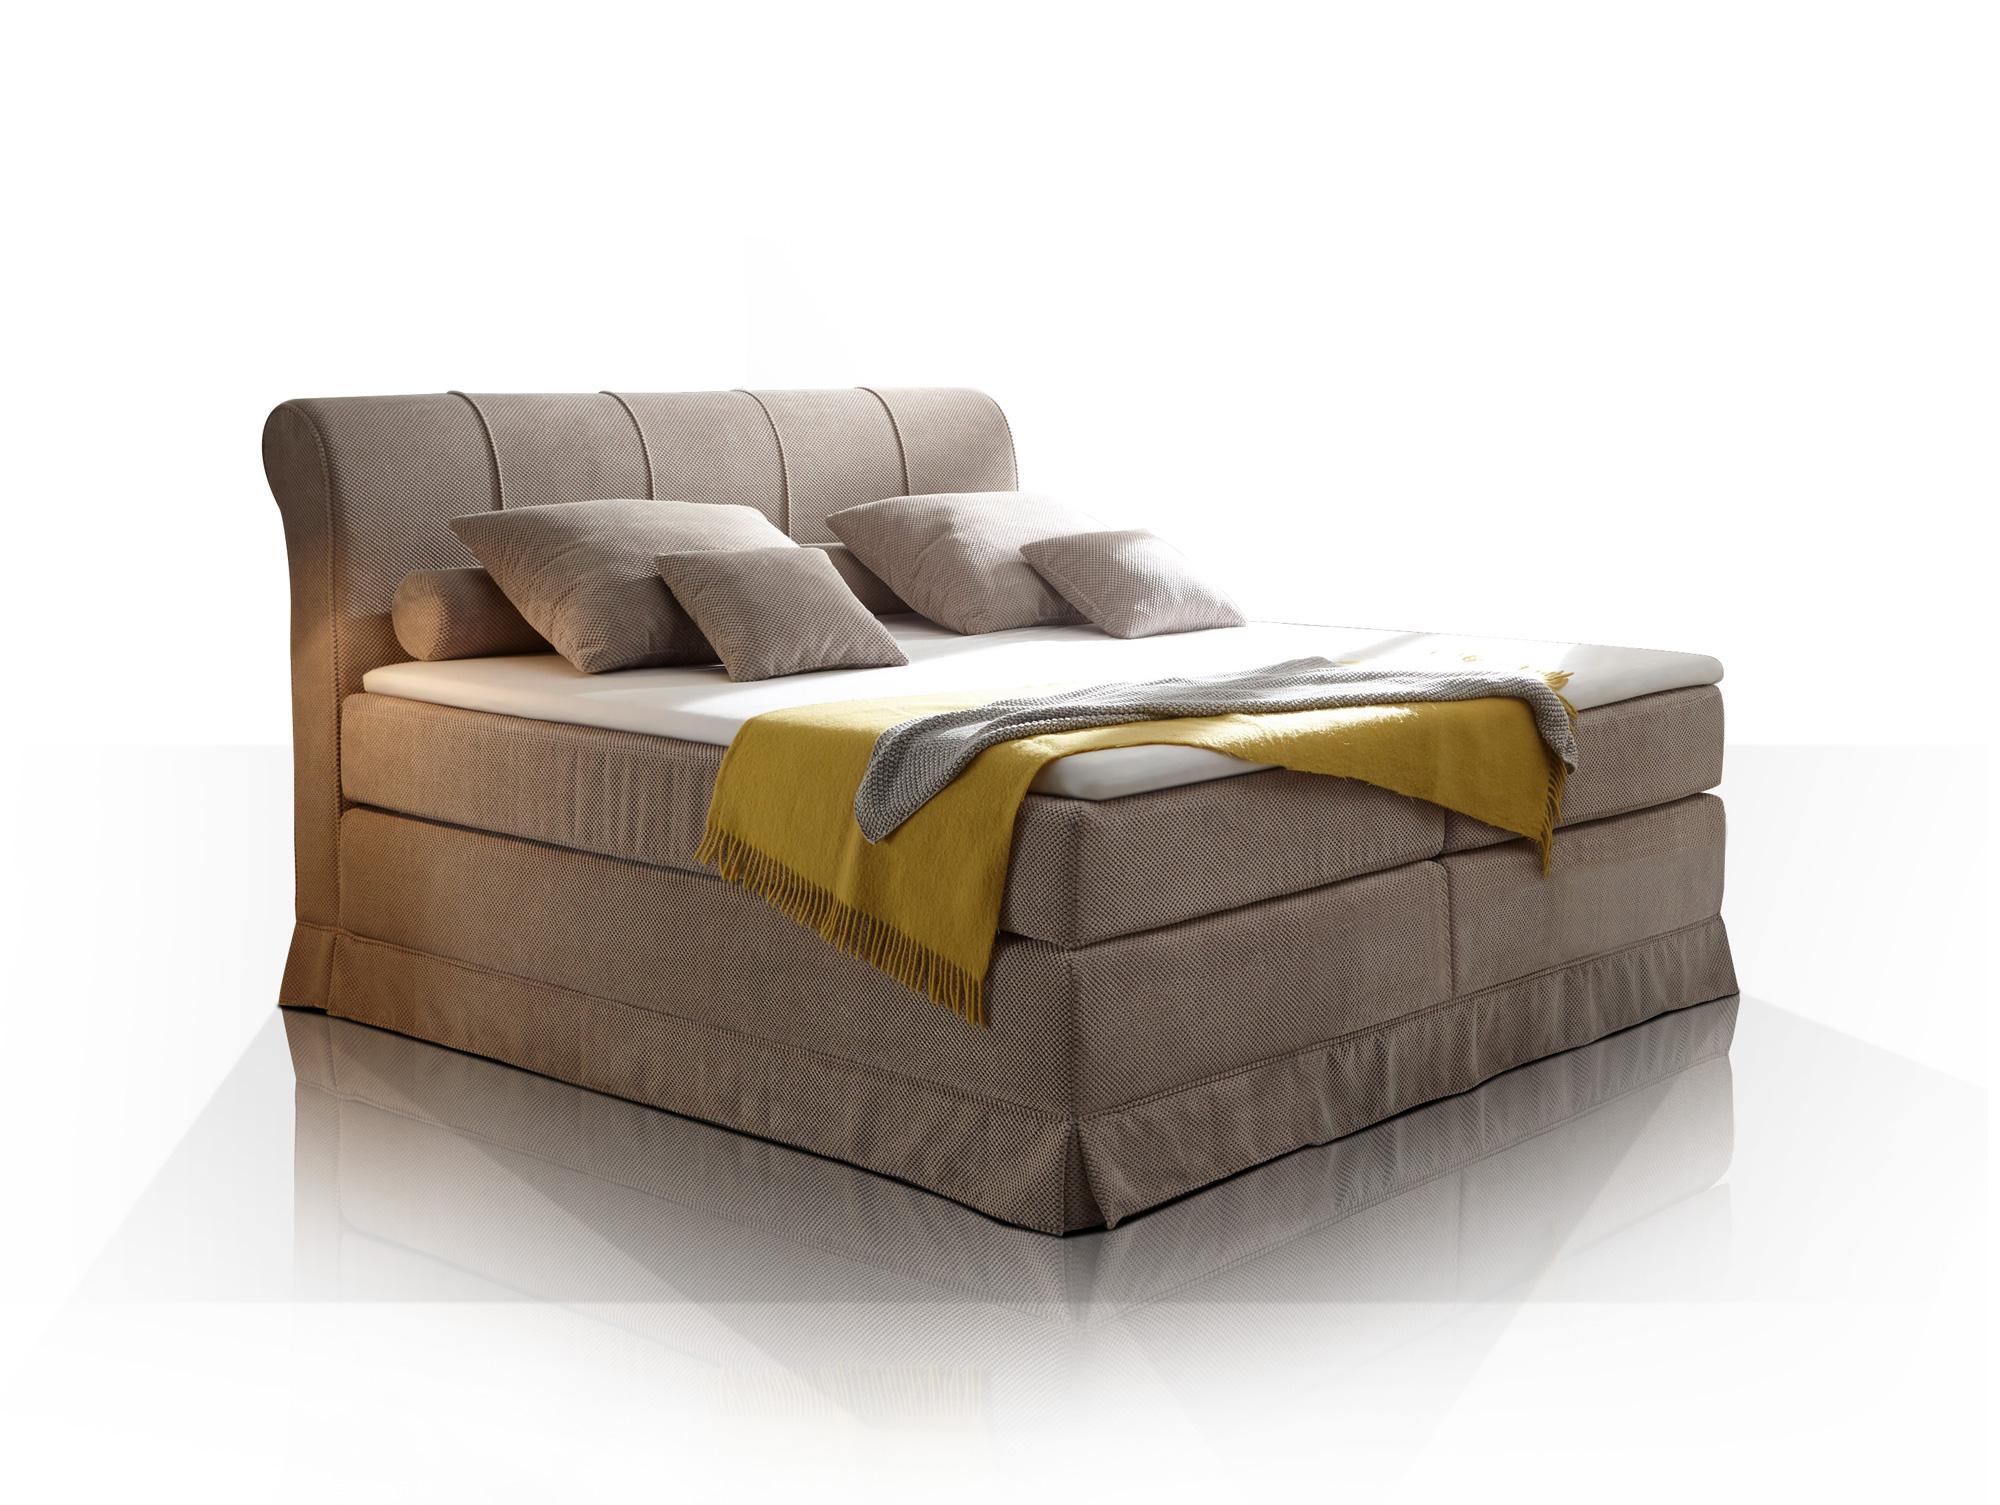 carlson boxspringbett beige beige mit kaltschaum topper. Black Bedroom Furniture Sets. Home Design Ideas